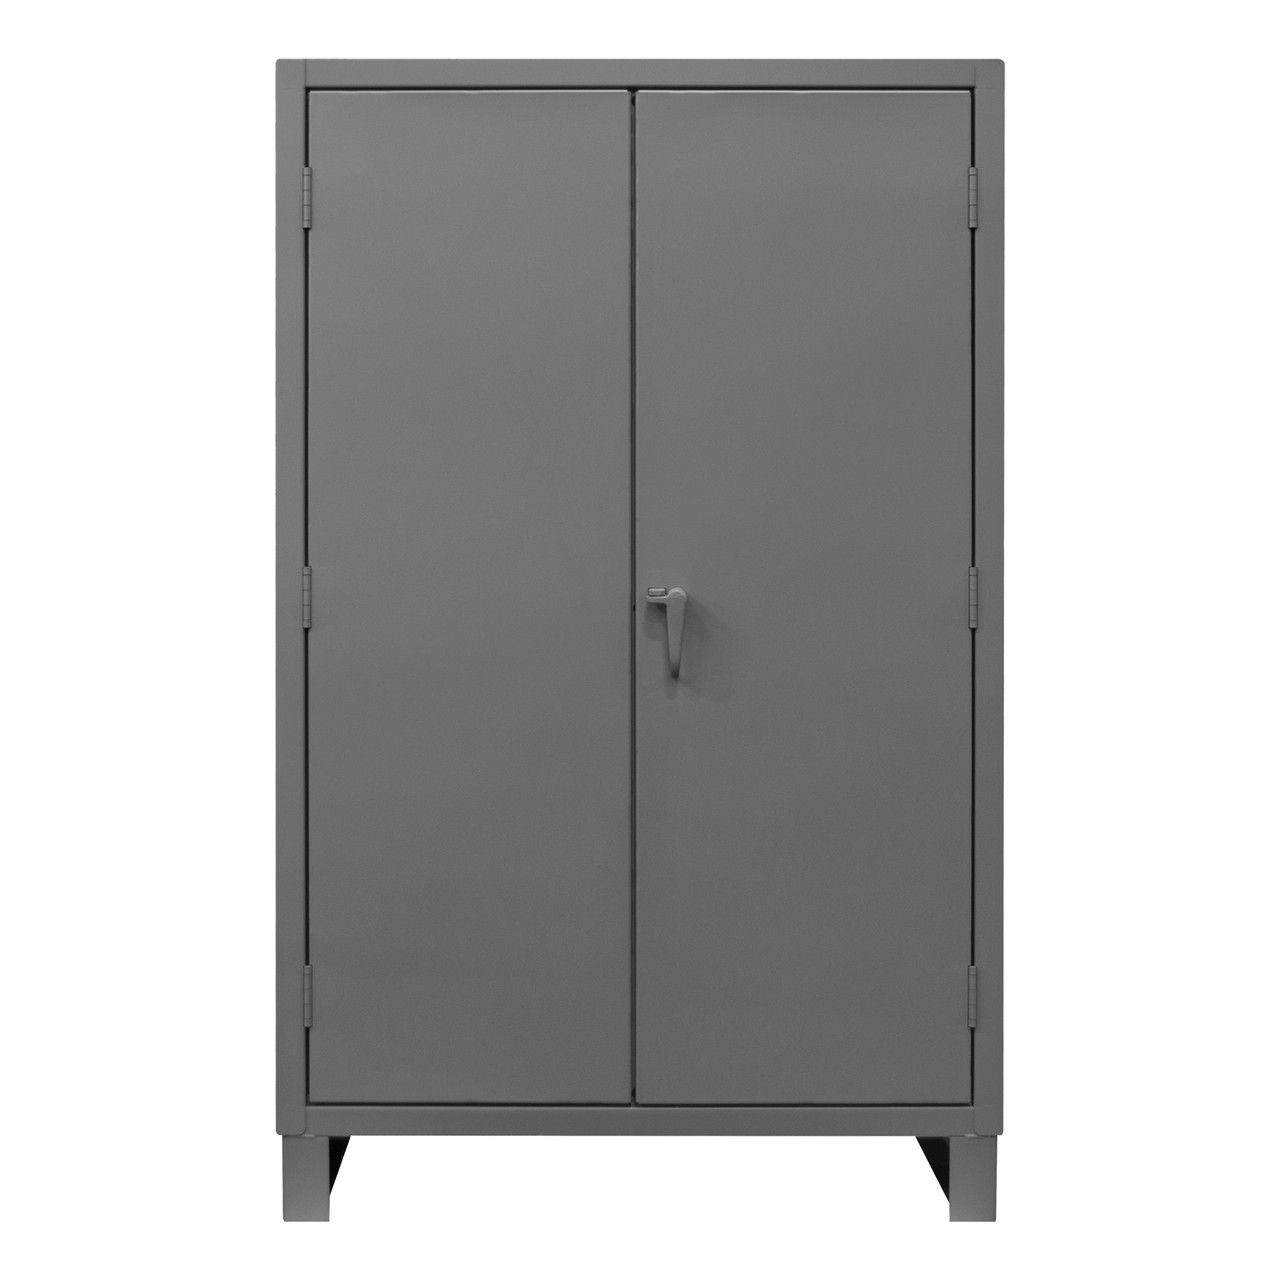 Shelf cabinet HDC-244878-4S95